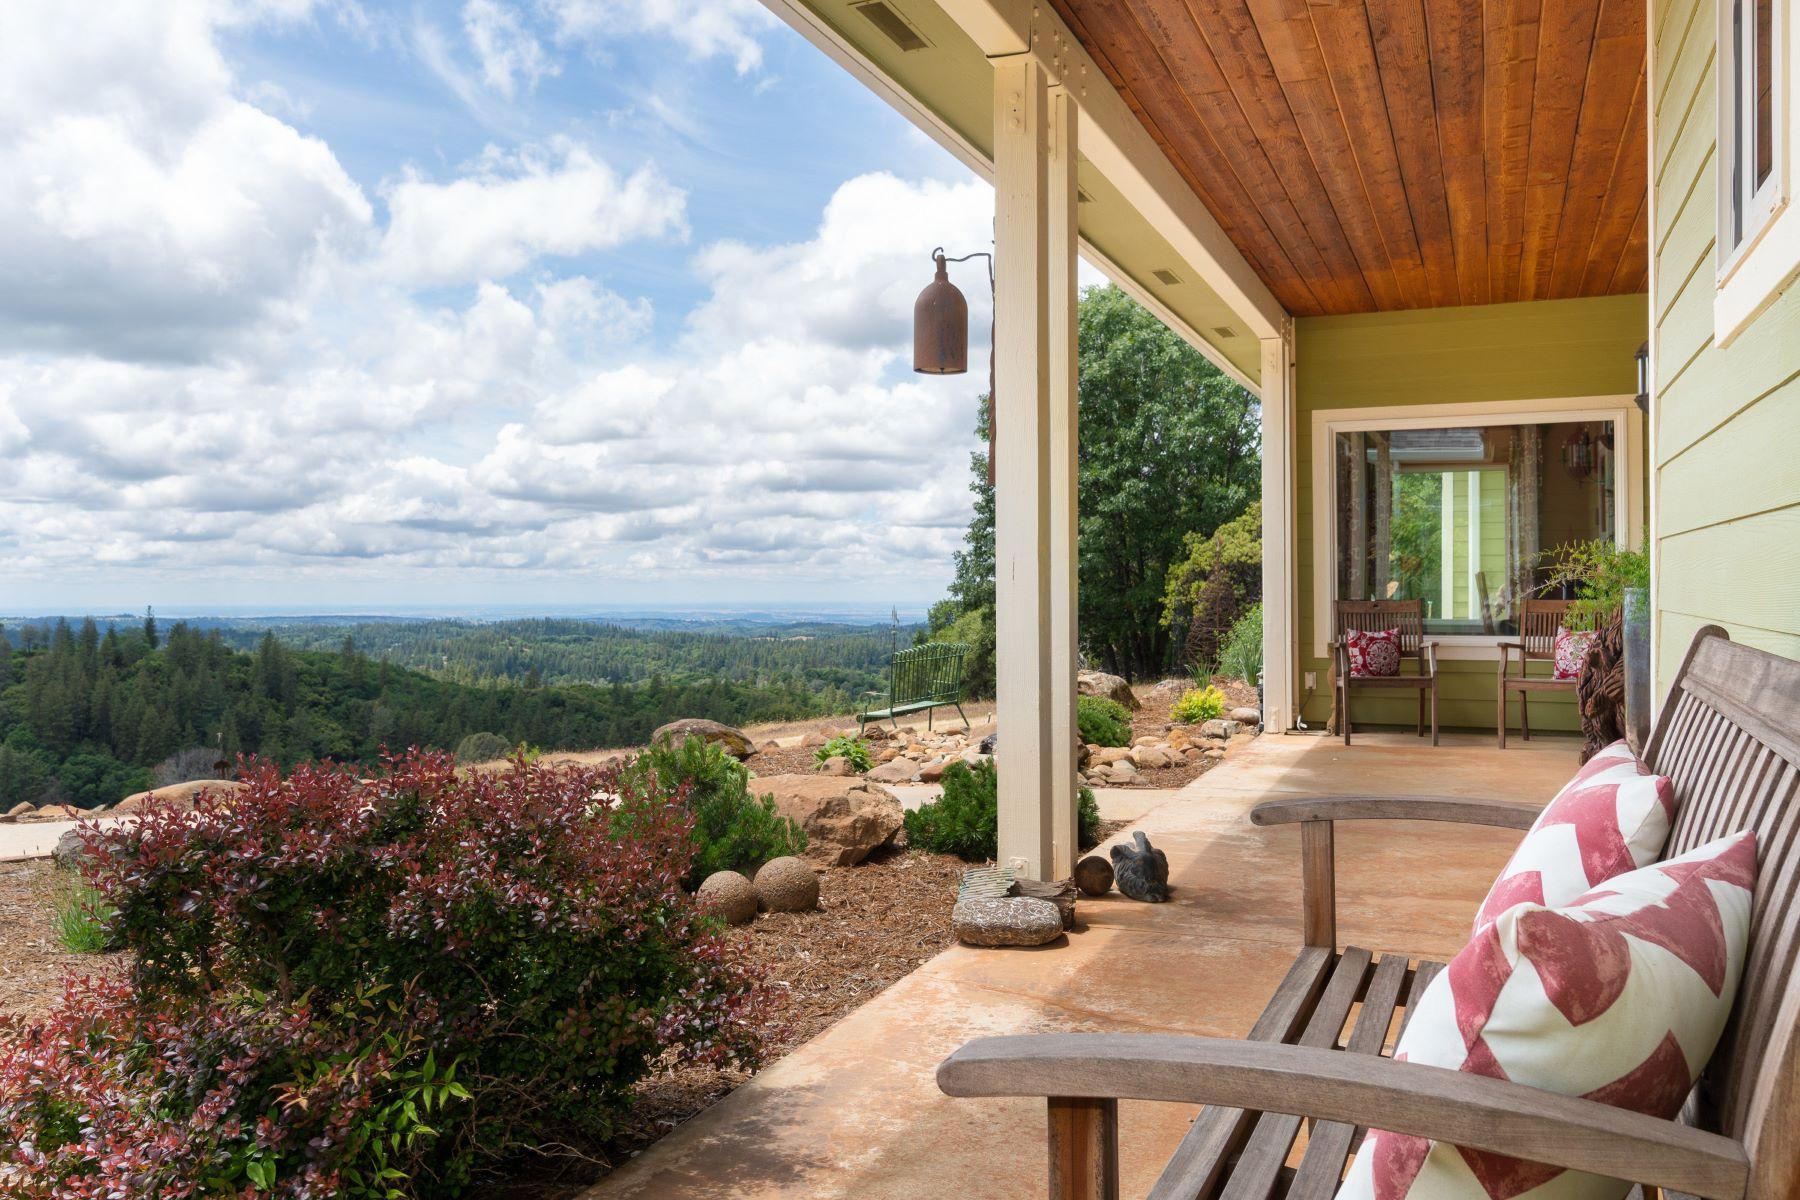 Single Family Homes por un Venta en Begin Living Your Best Lifestyle at the Hilltop Ranch 16671 Stone Jug Road Sutter Creek, California 95685 Estados Unidos